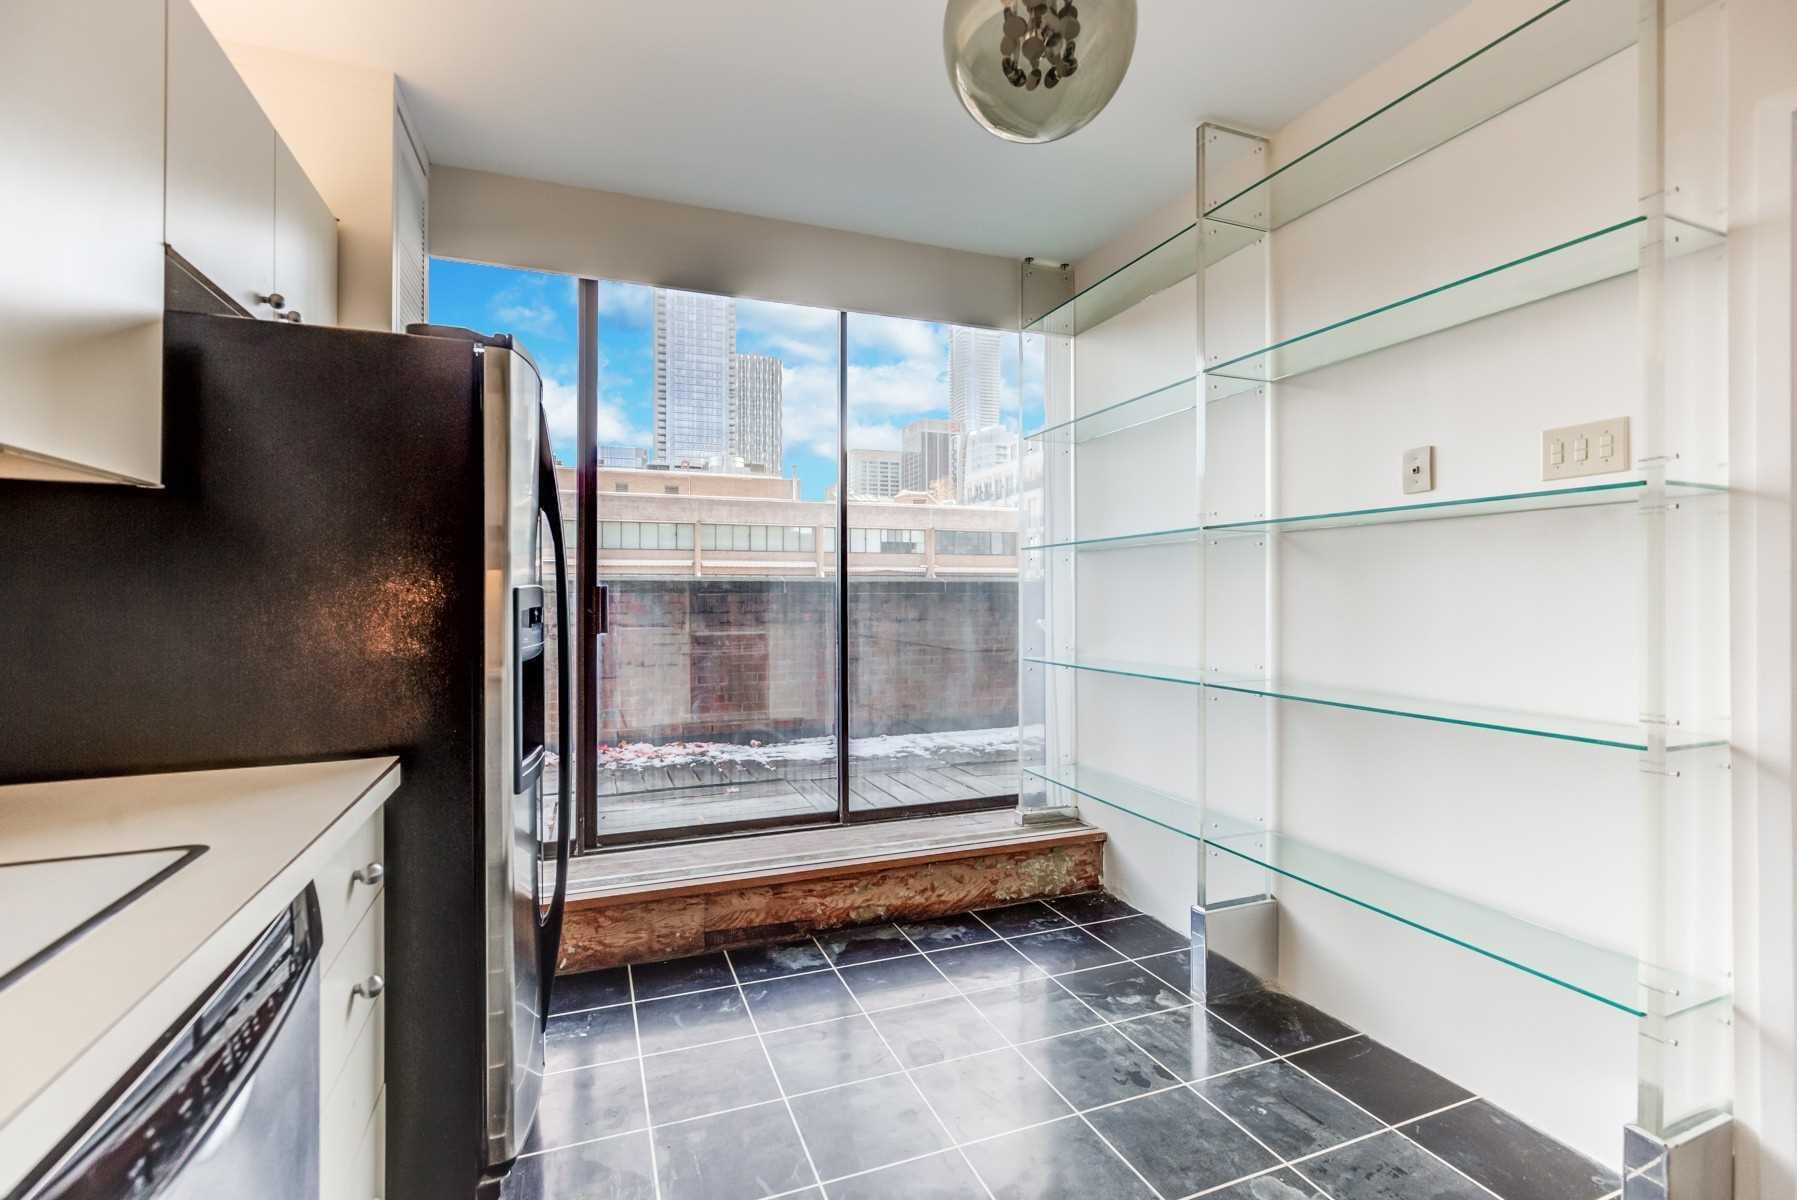 607 - 55A Avenue Rd - Annex Condo Apt for sale, 2 Bedrooms (C5185690) - #19